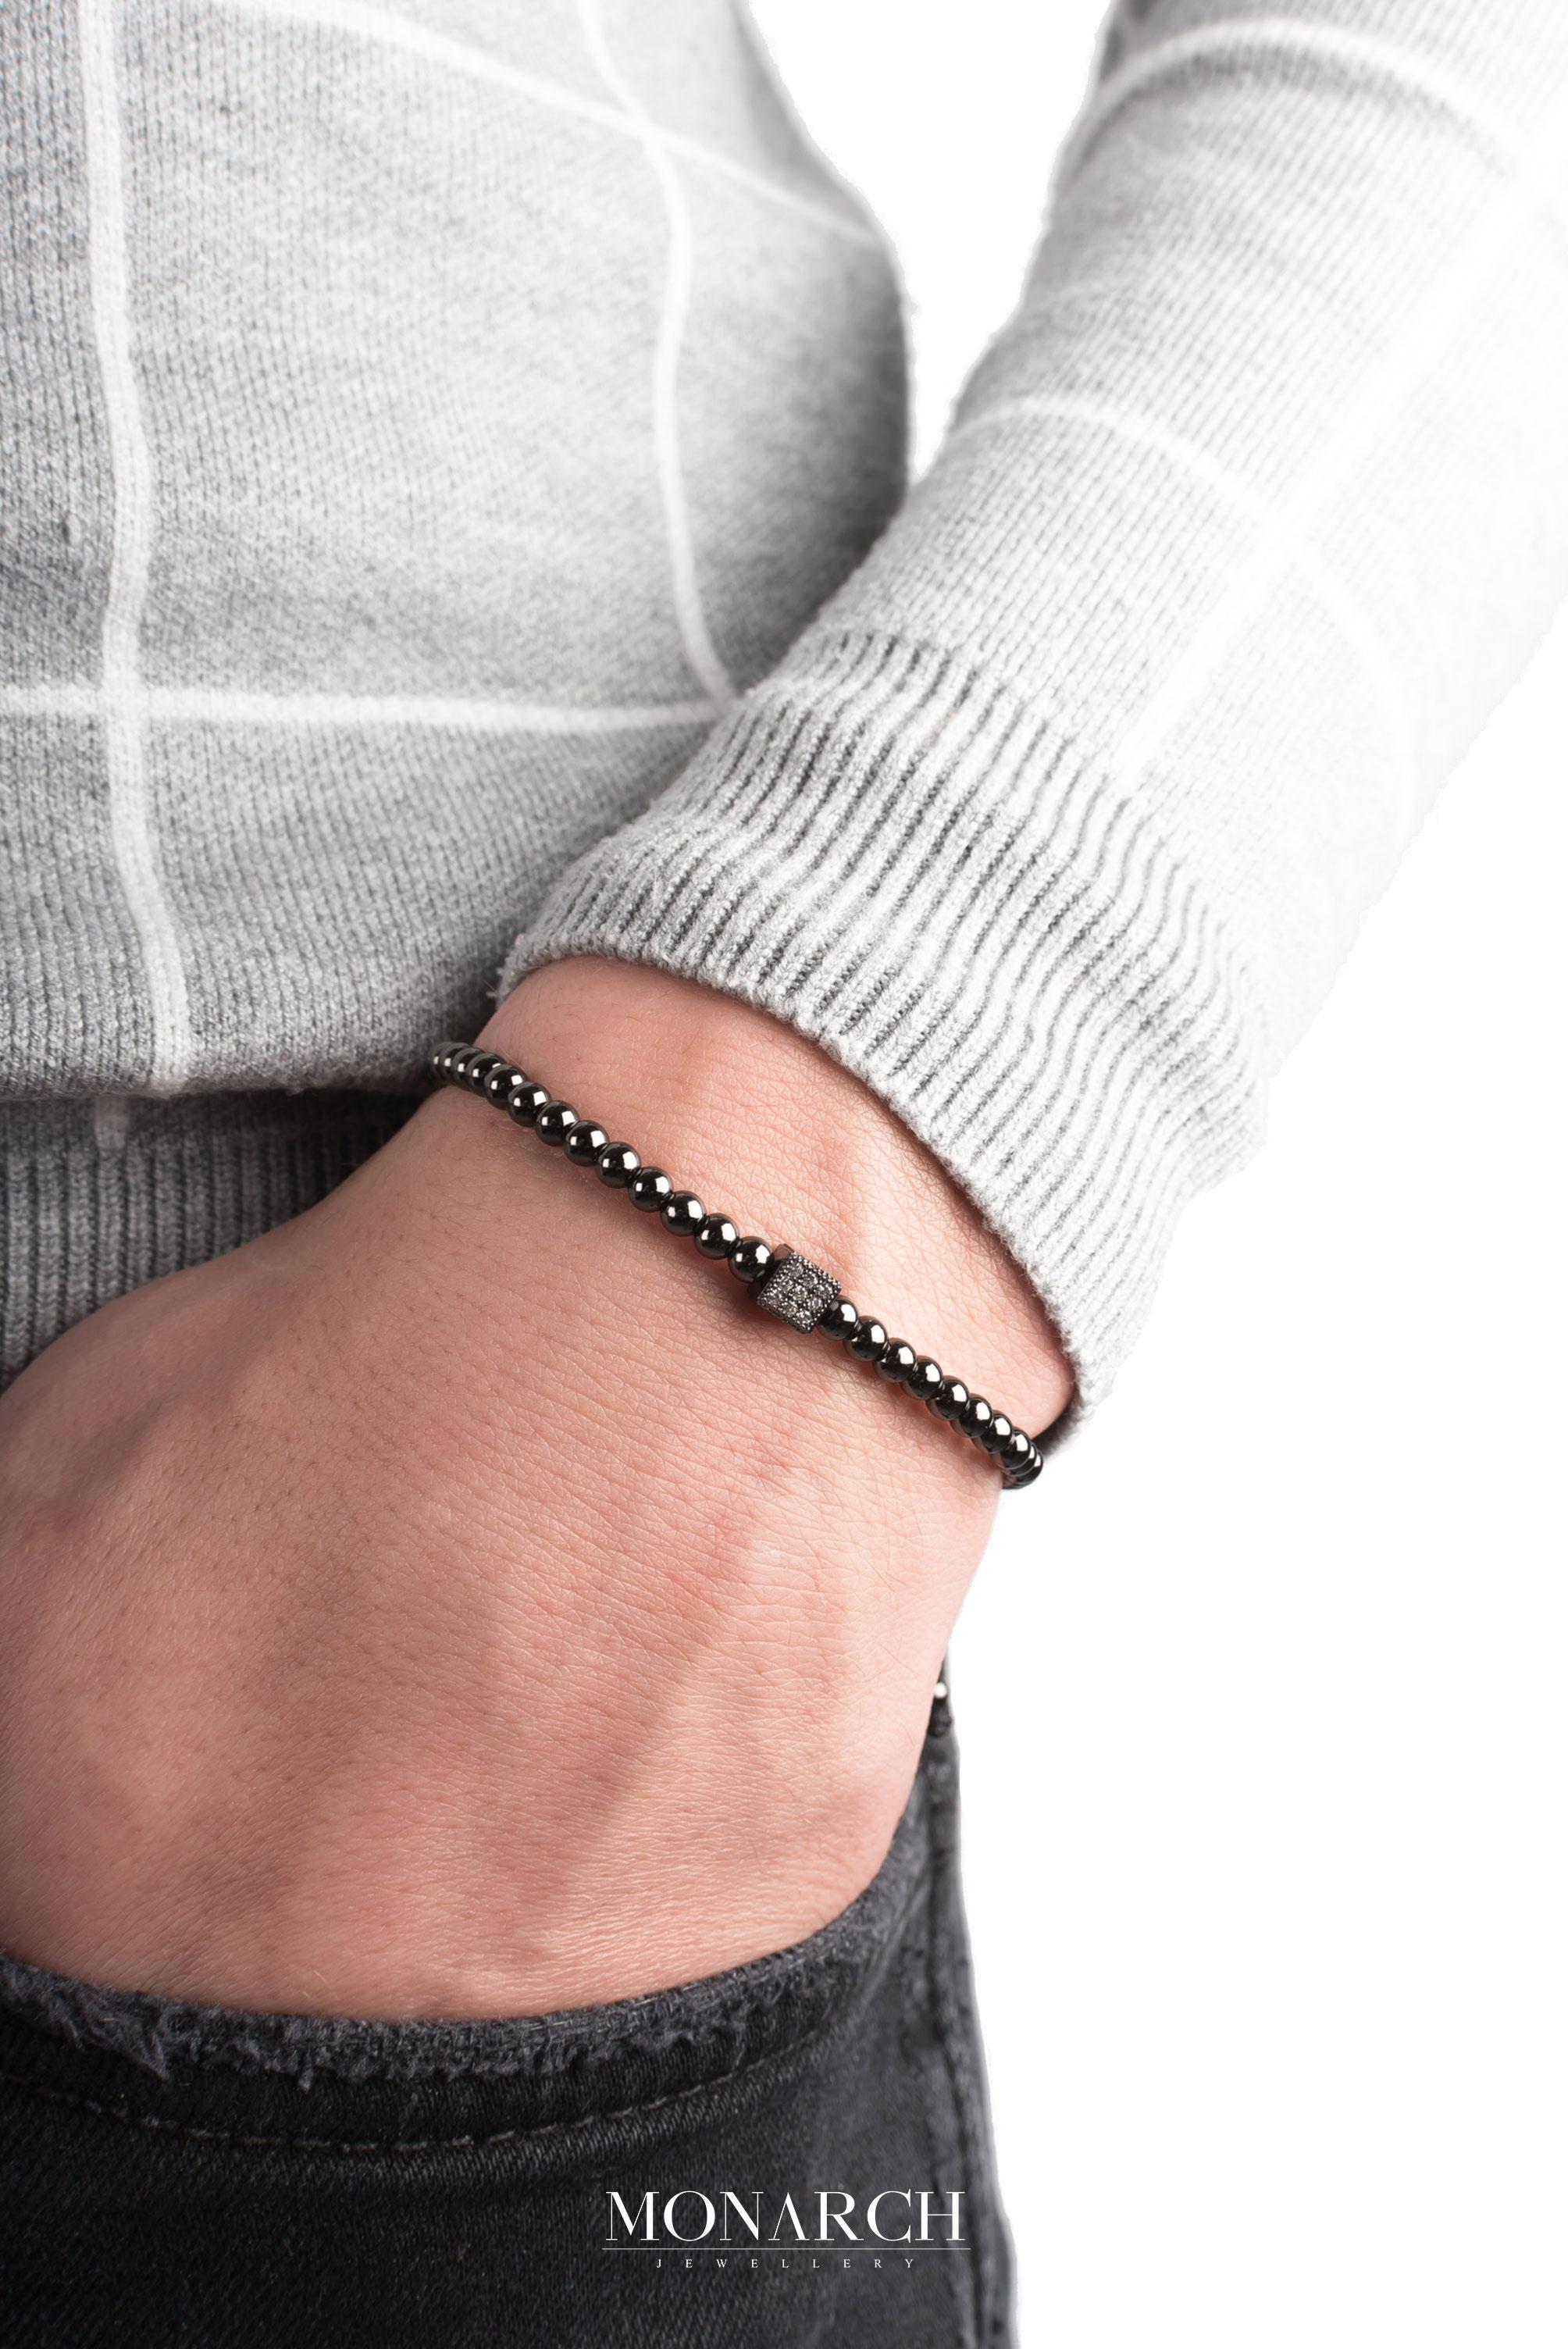 black luxury bracelet for man, monarch jewellery MA61BCUB